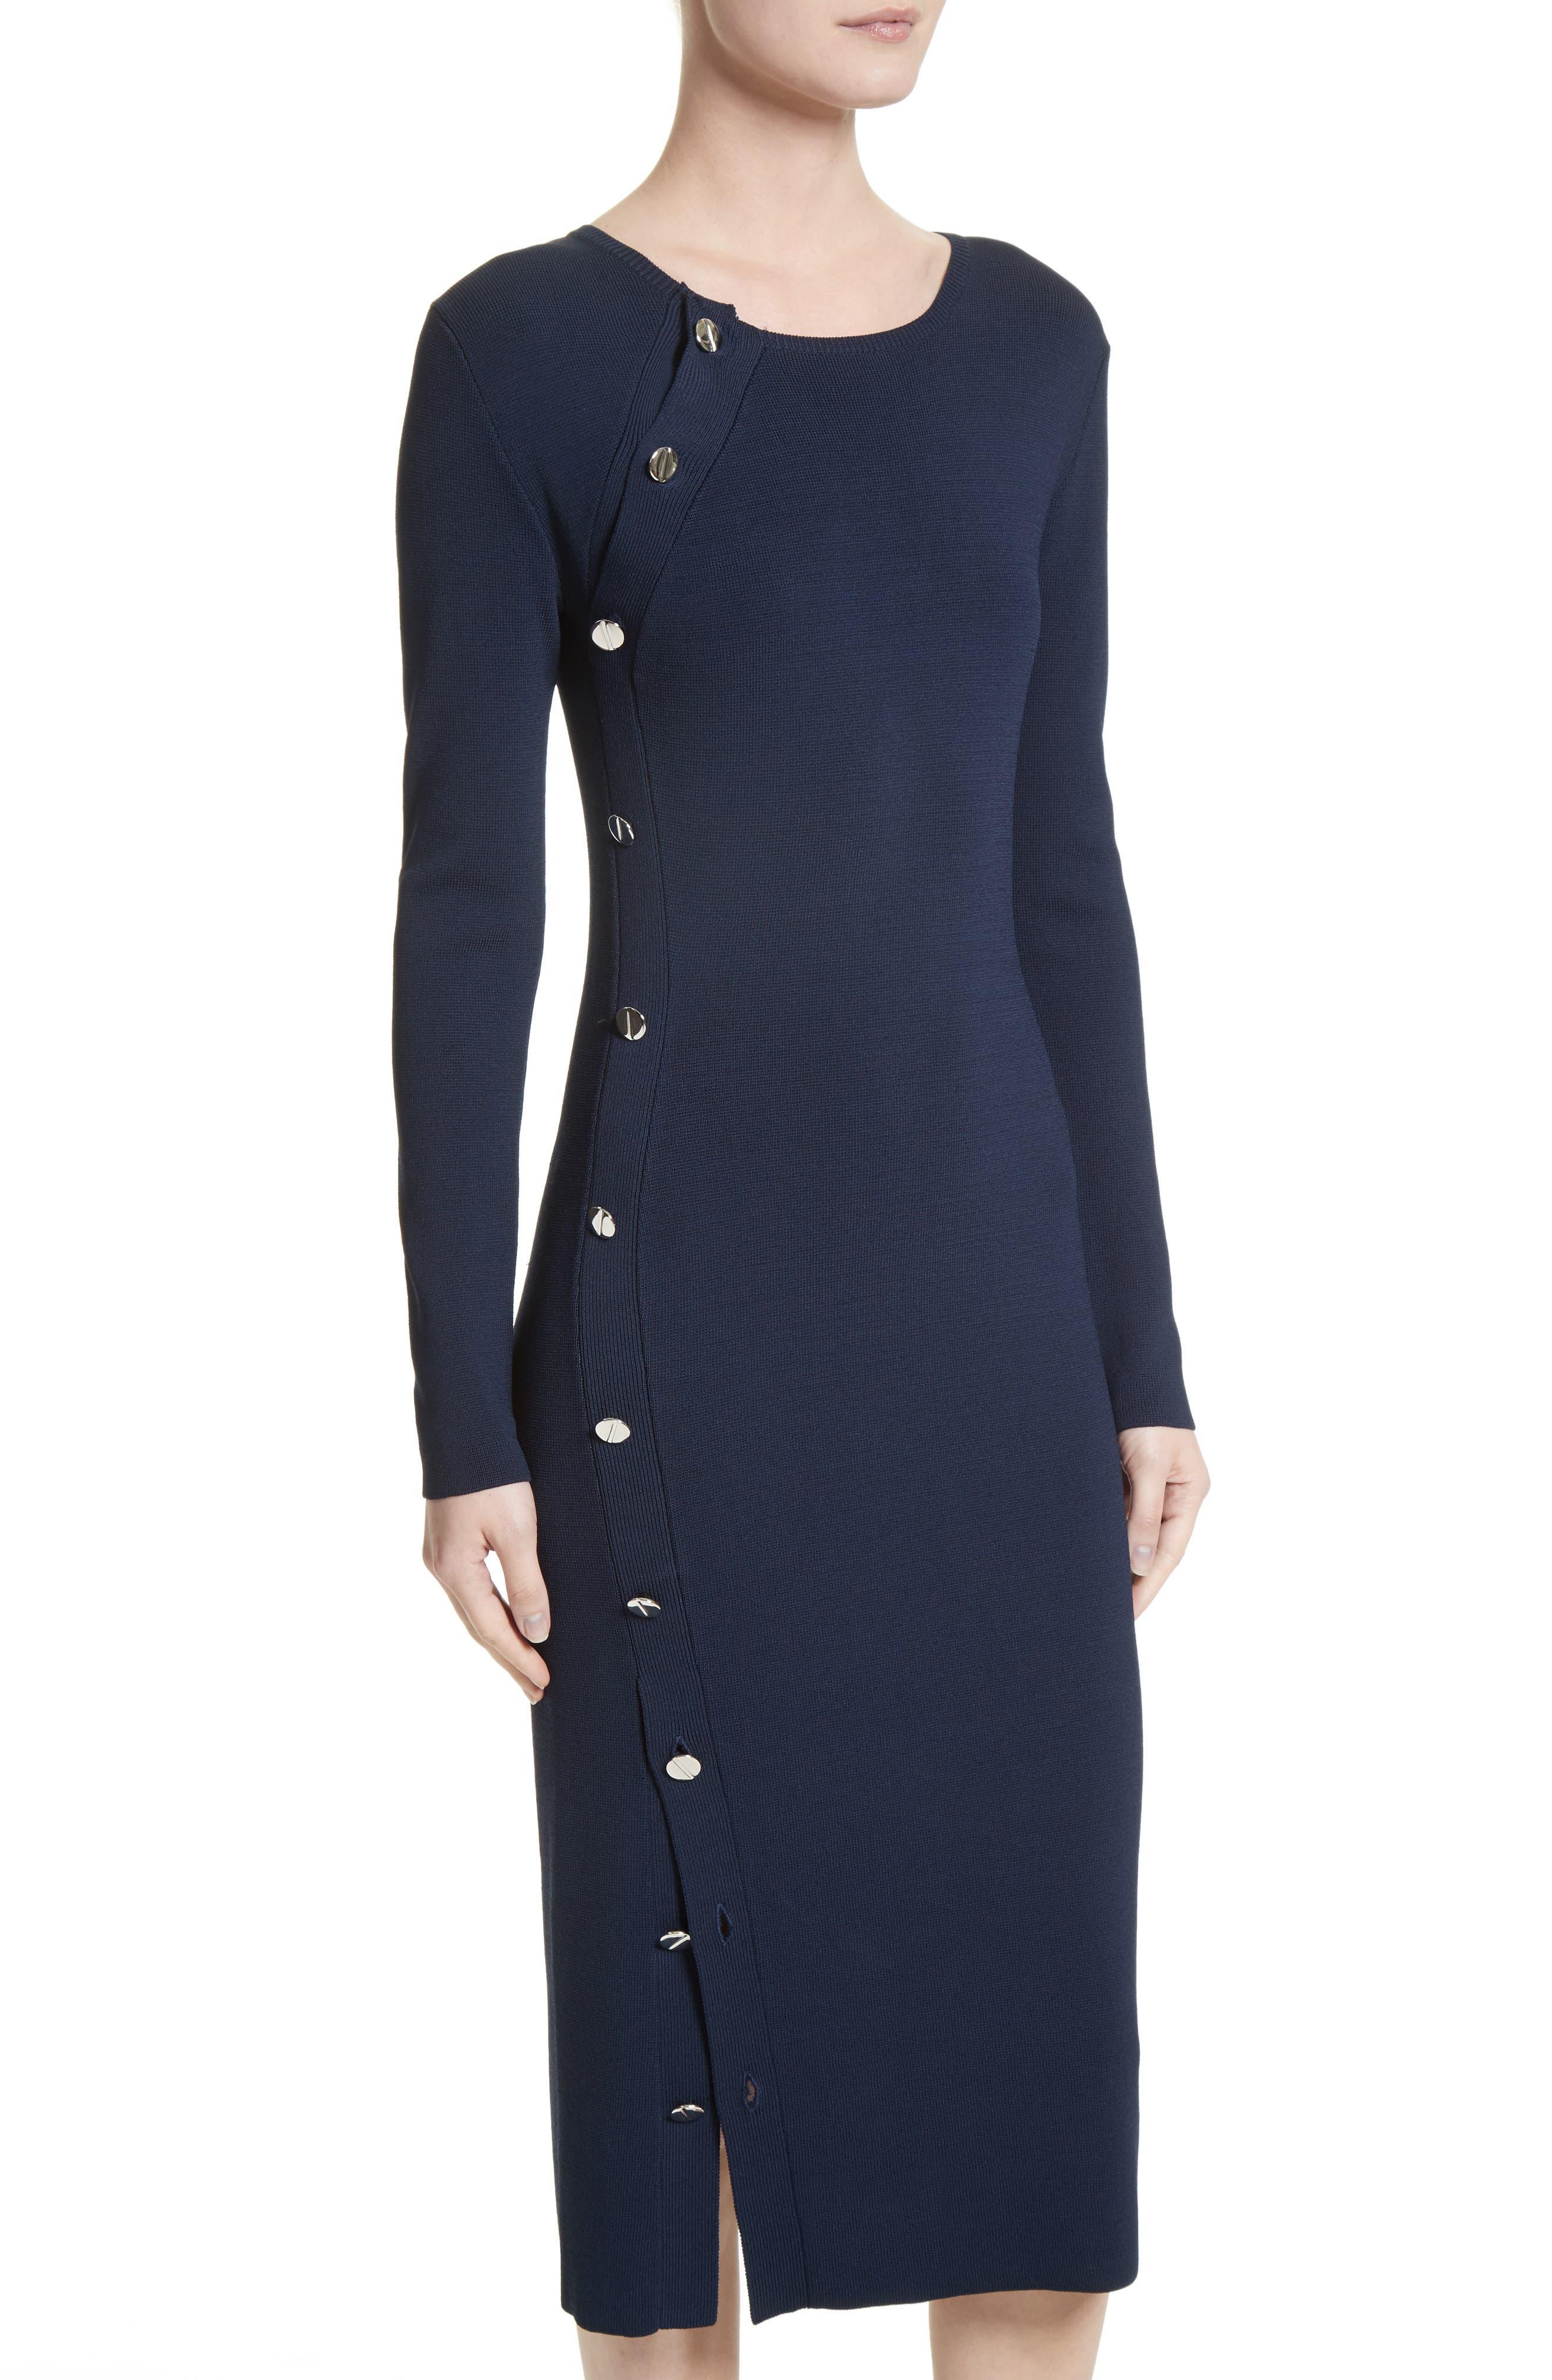 Button Detail Knit Dress,                             Alternate thumbnail 4, color,                             Navy